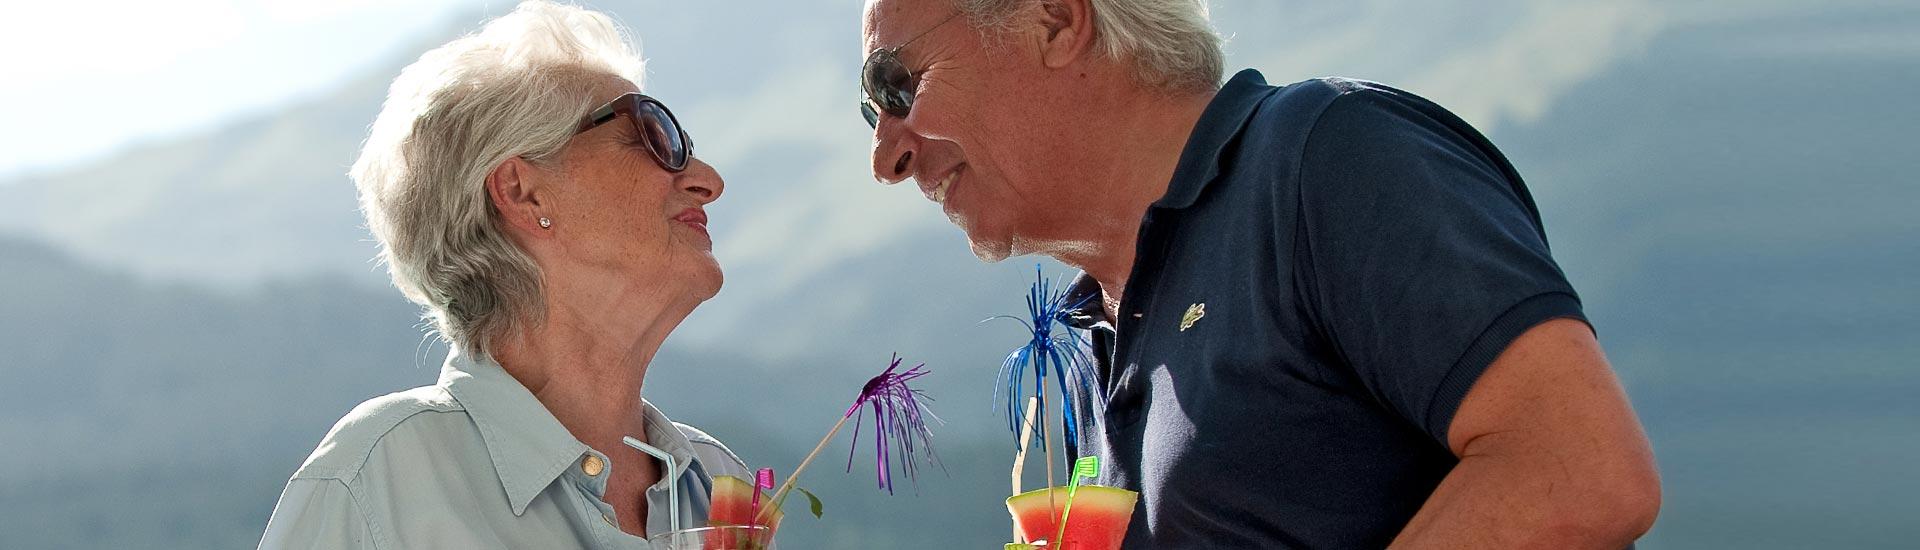 Hotel Impuls Tirol Kur mit Partner